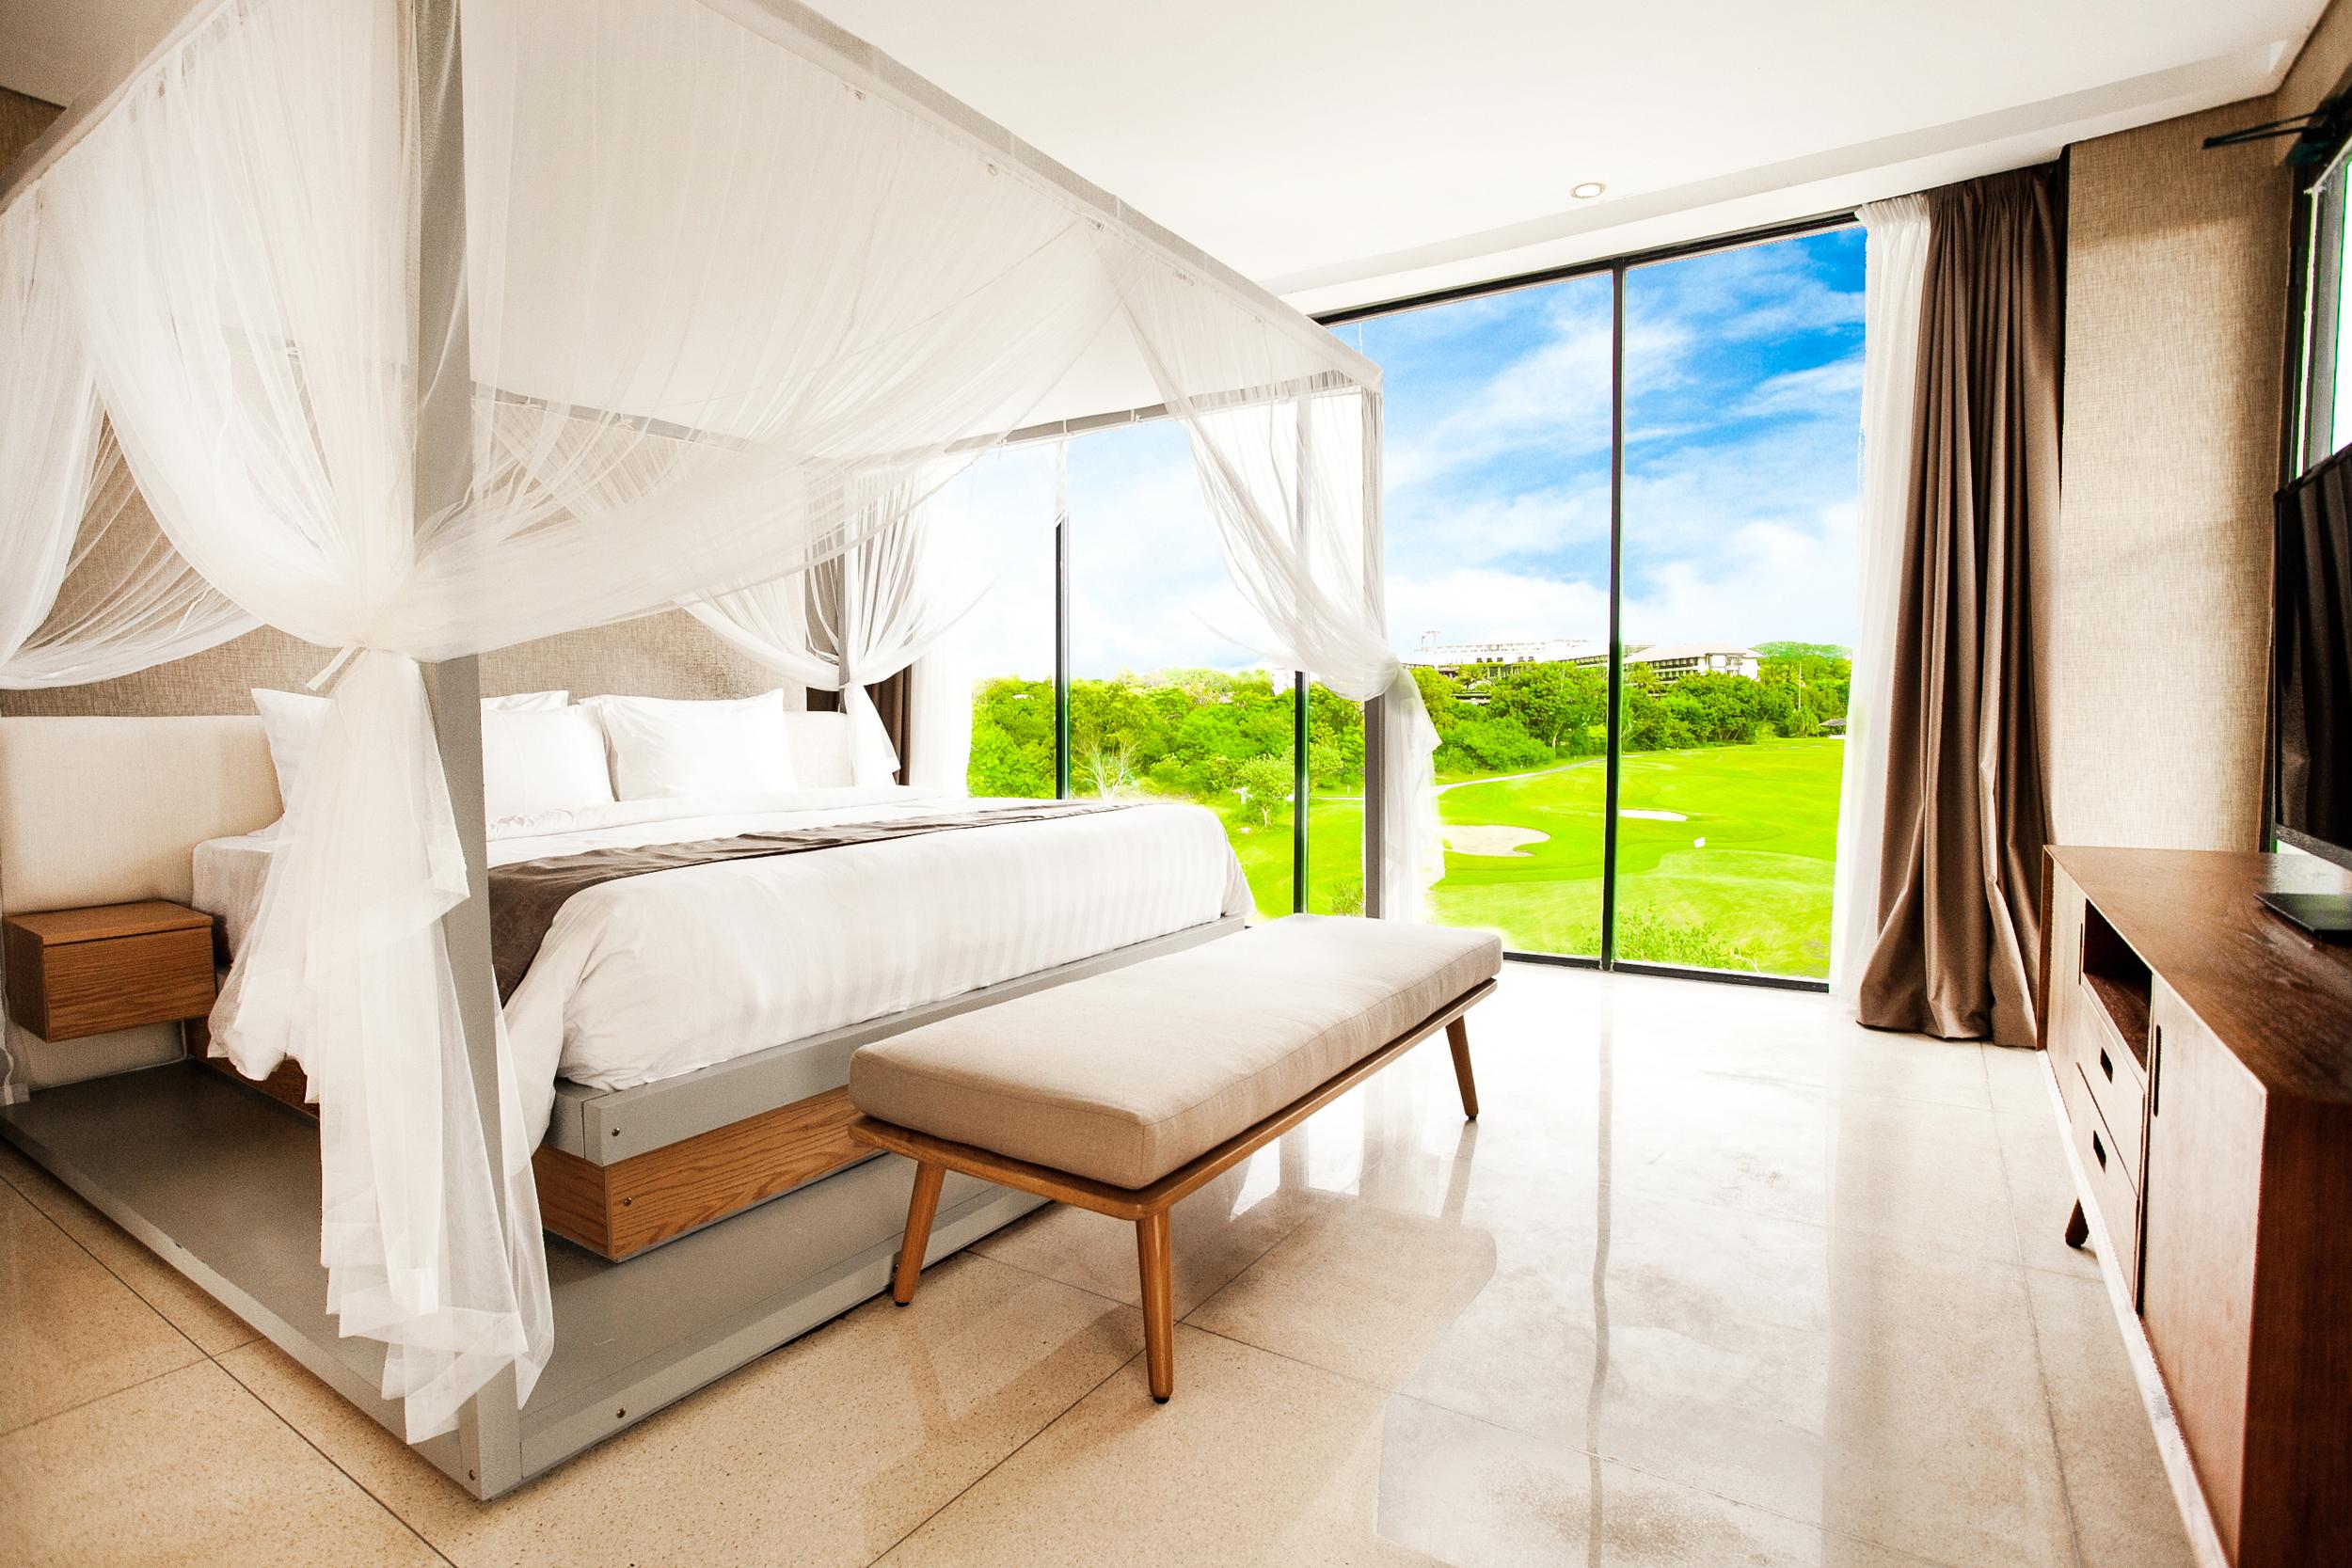 Dreamland Penthouse  Bali - Indonesia